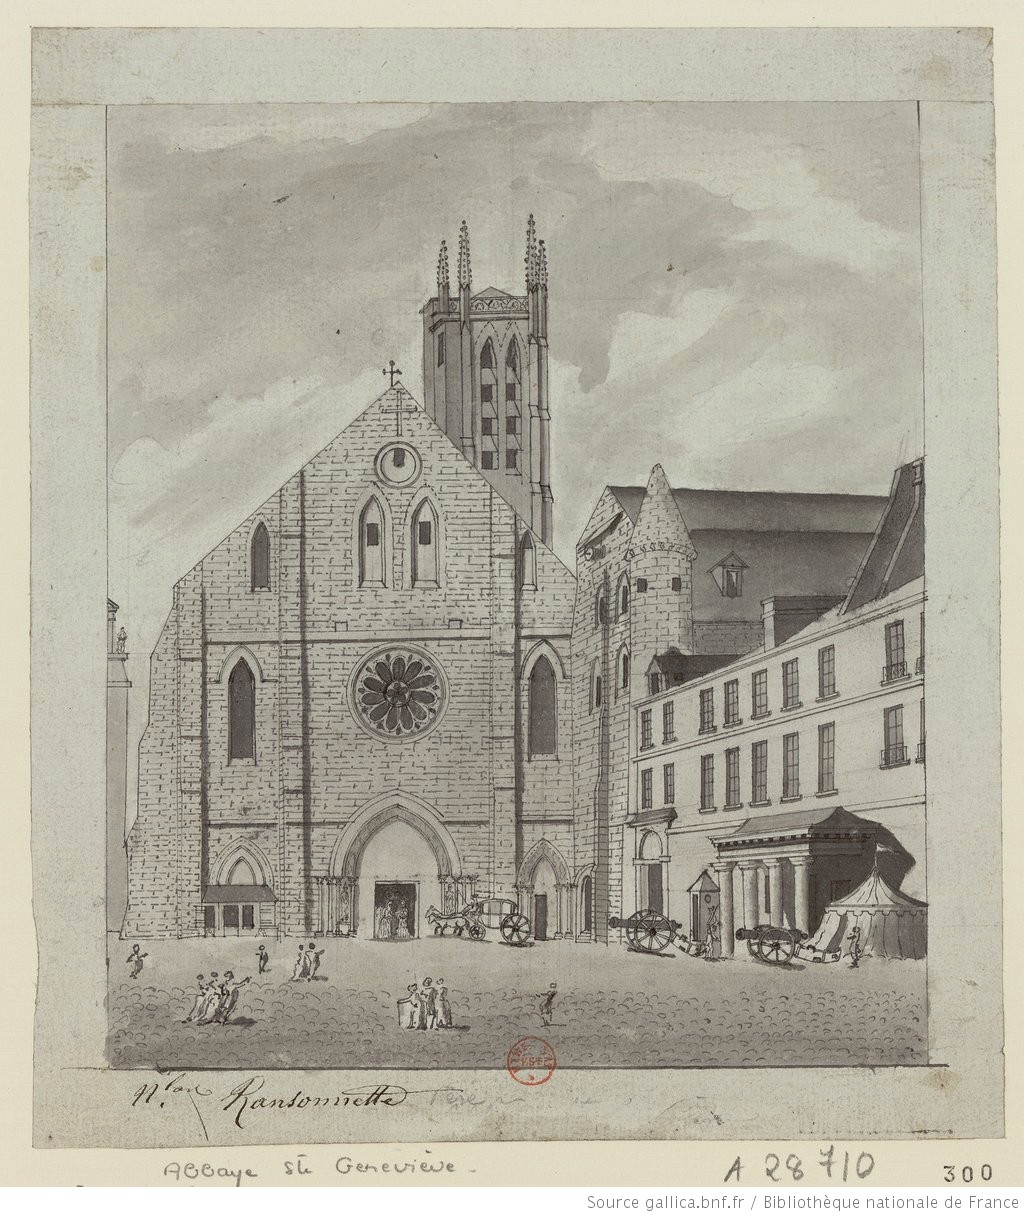 ➢Ransonnette, Nicolas (1745-1810)